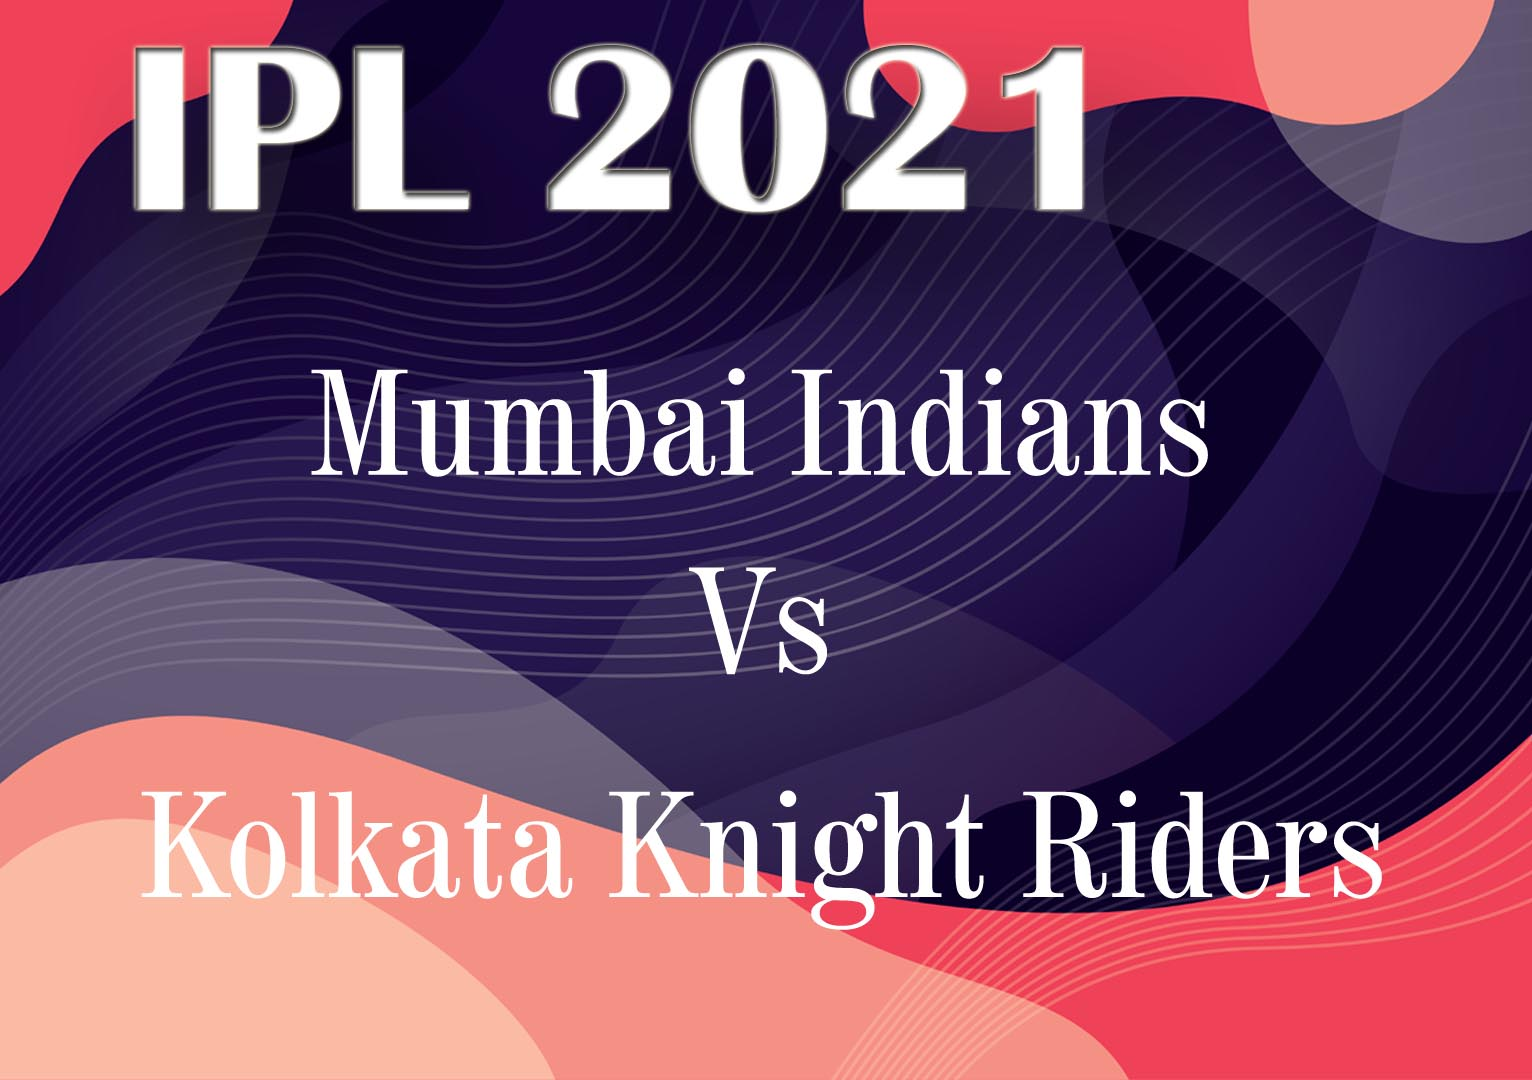 Highlights of Kolkata Knight Riders vs Mumbai Indians Match 5 IPL 2021.